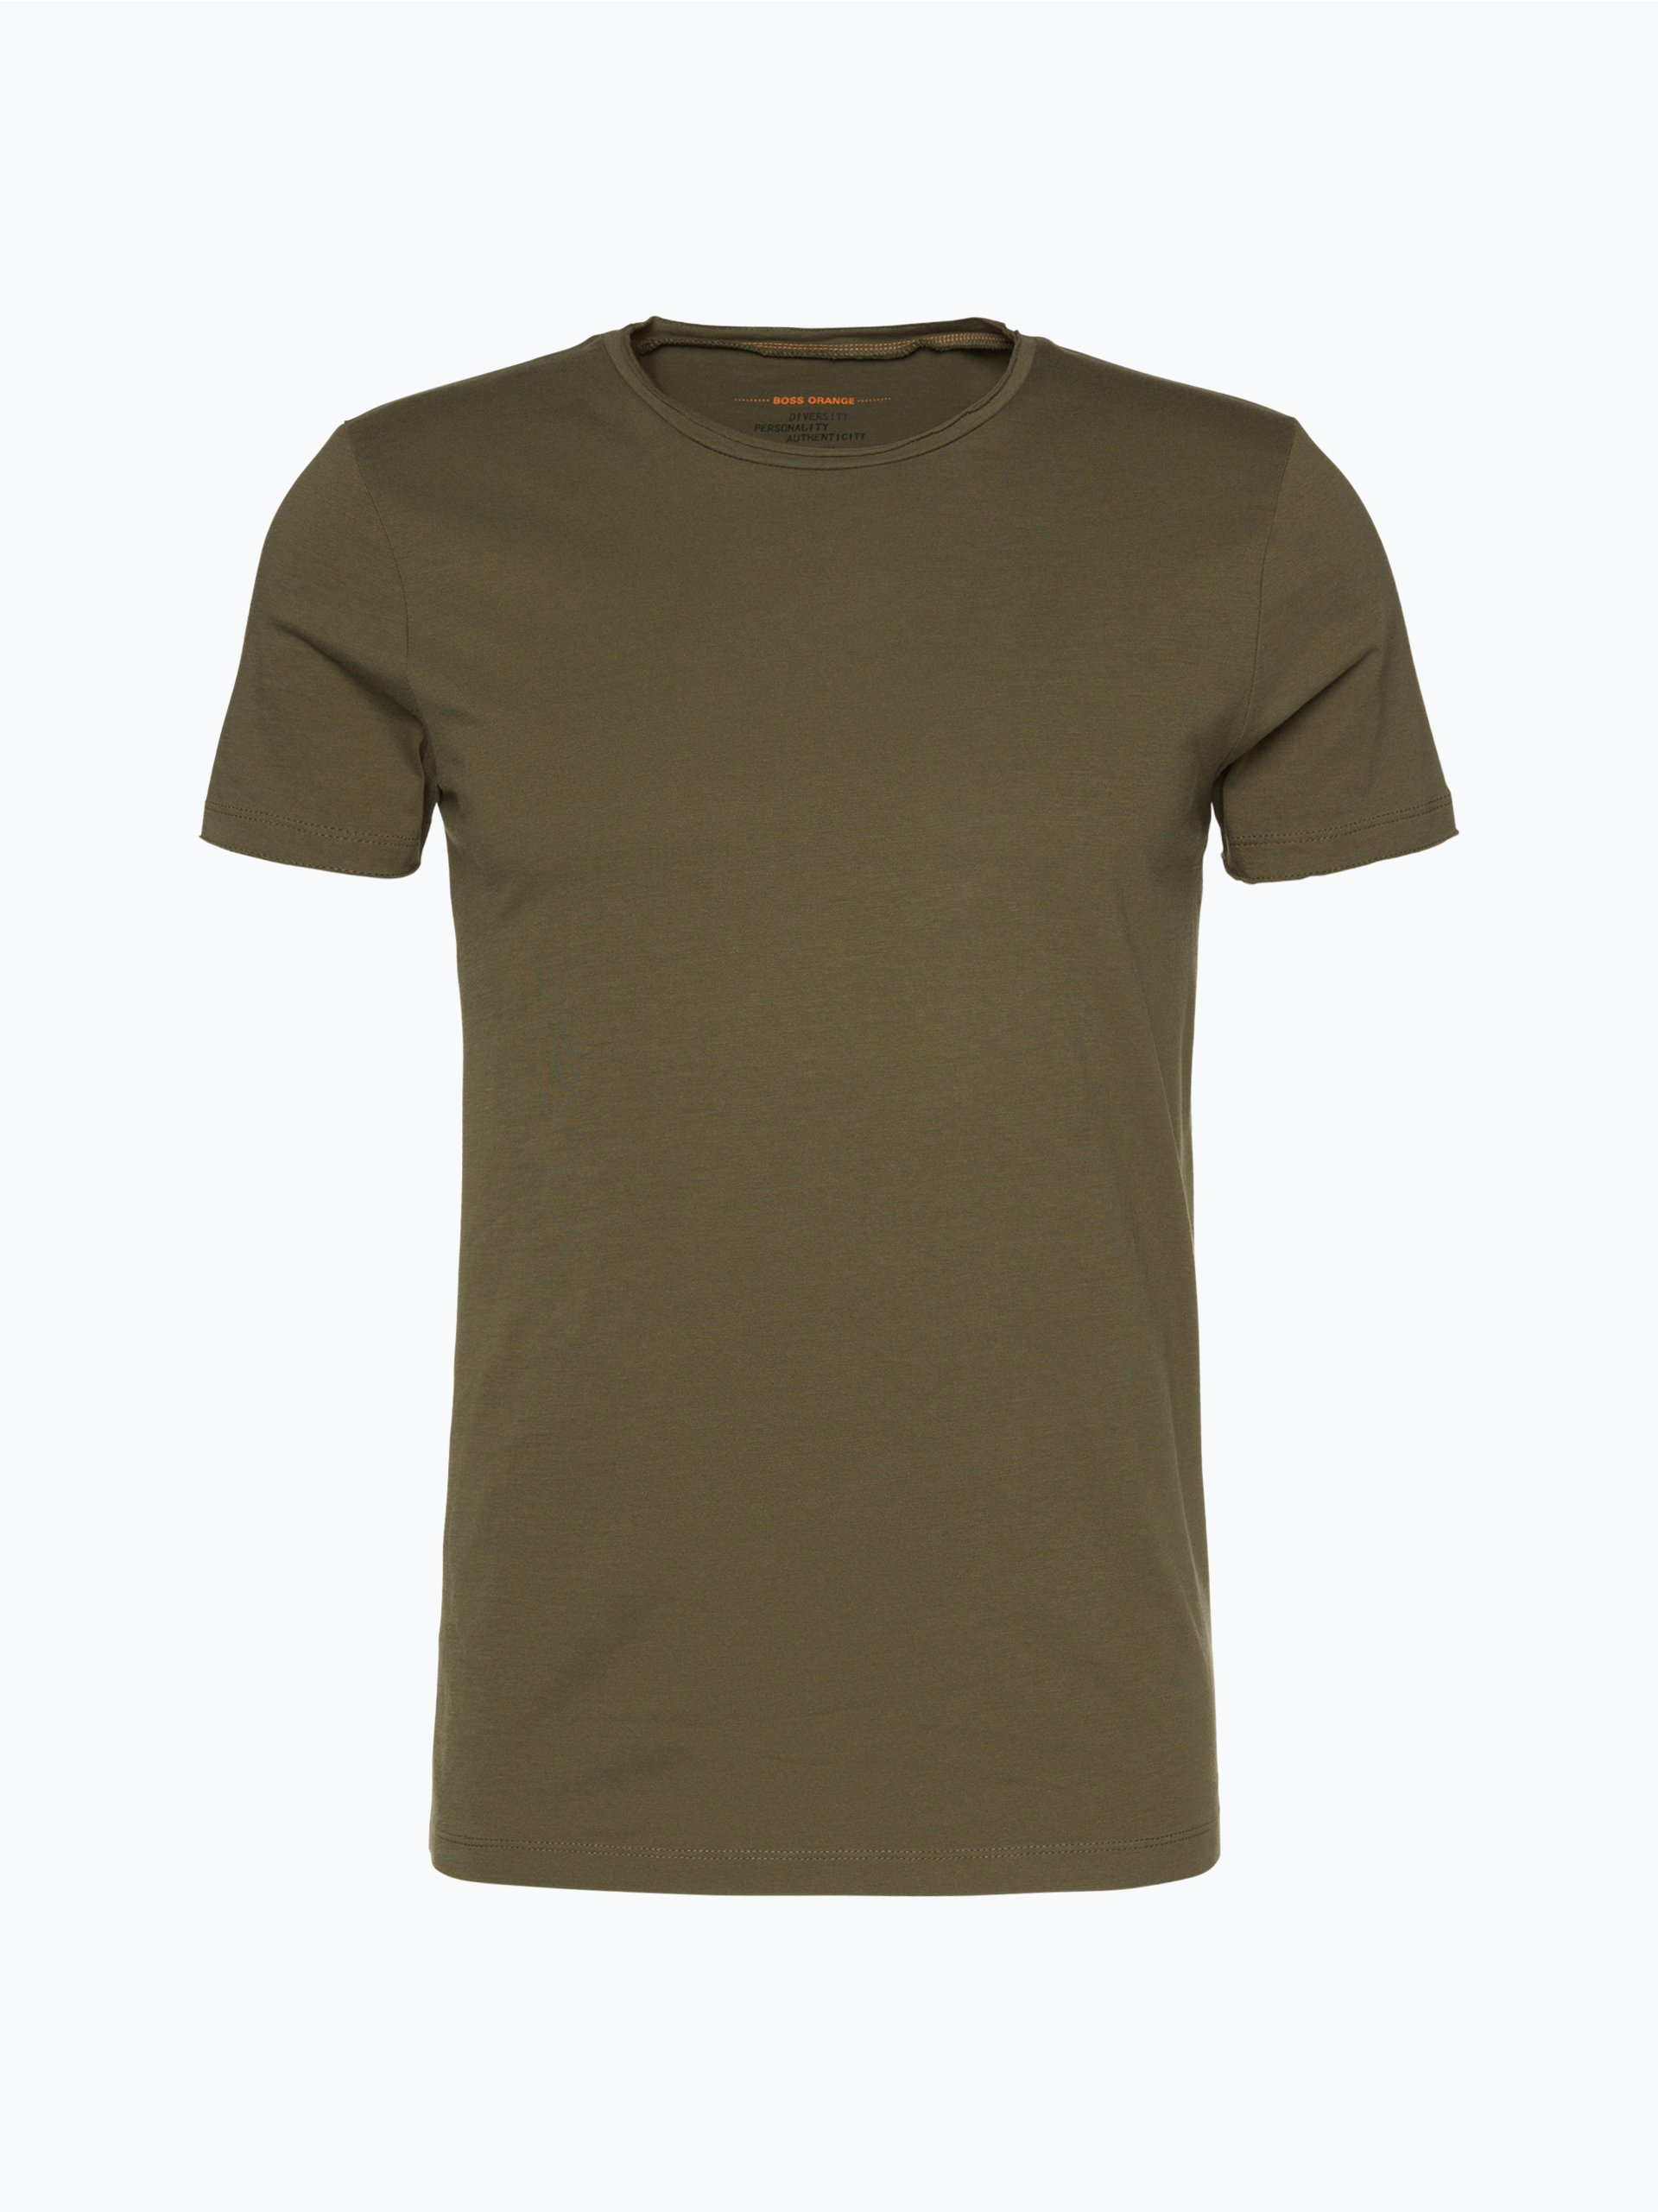 boss casual herren t shirt tooles oliv uni online kaufen. Black Bedroom Furniture Sets. Home Design Ideas